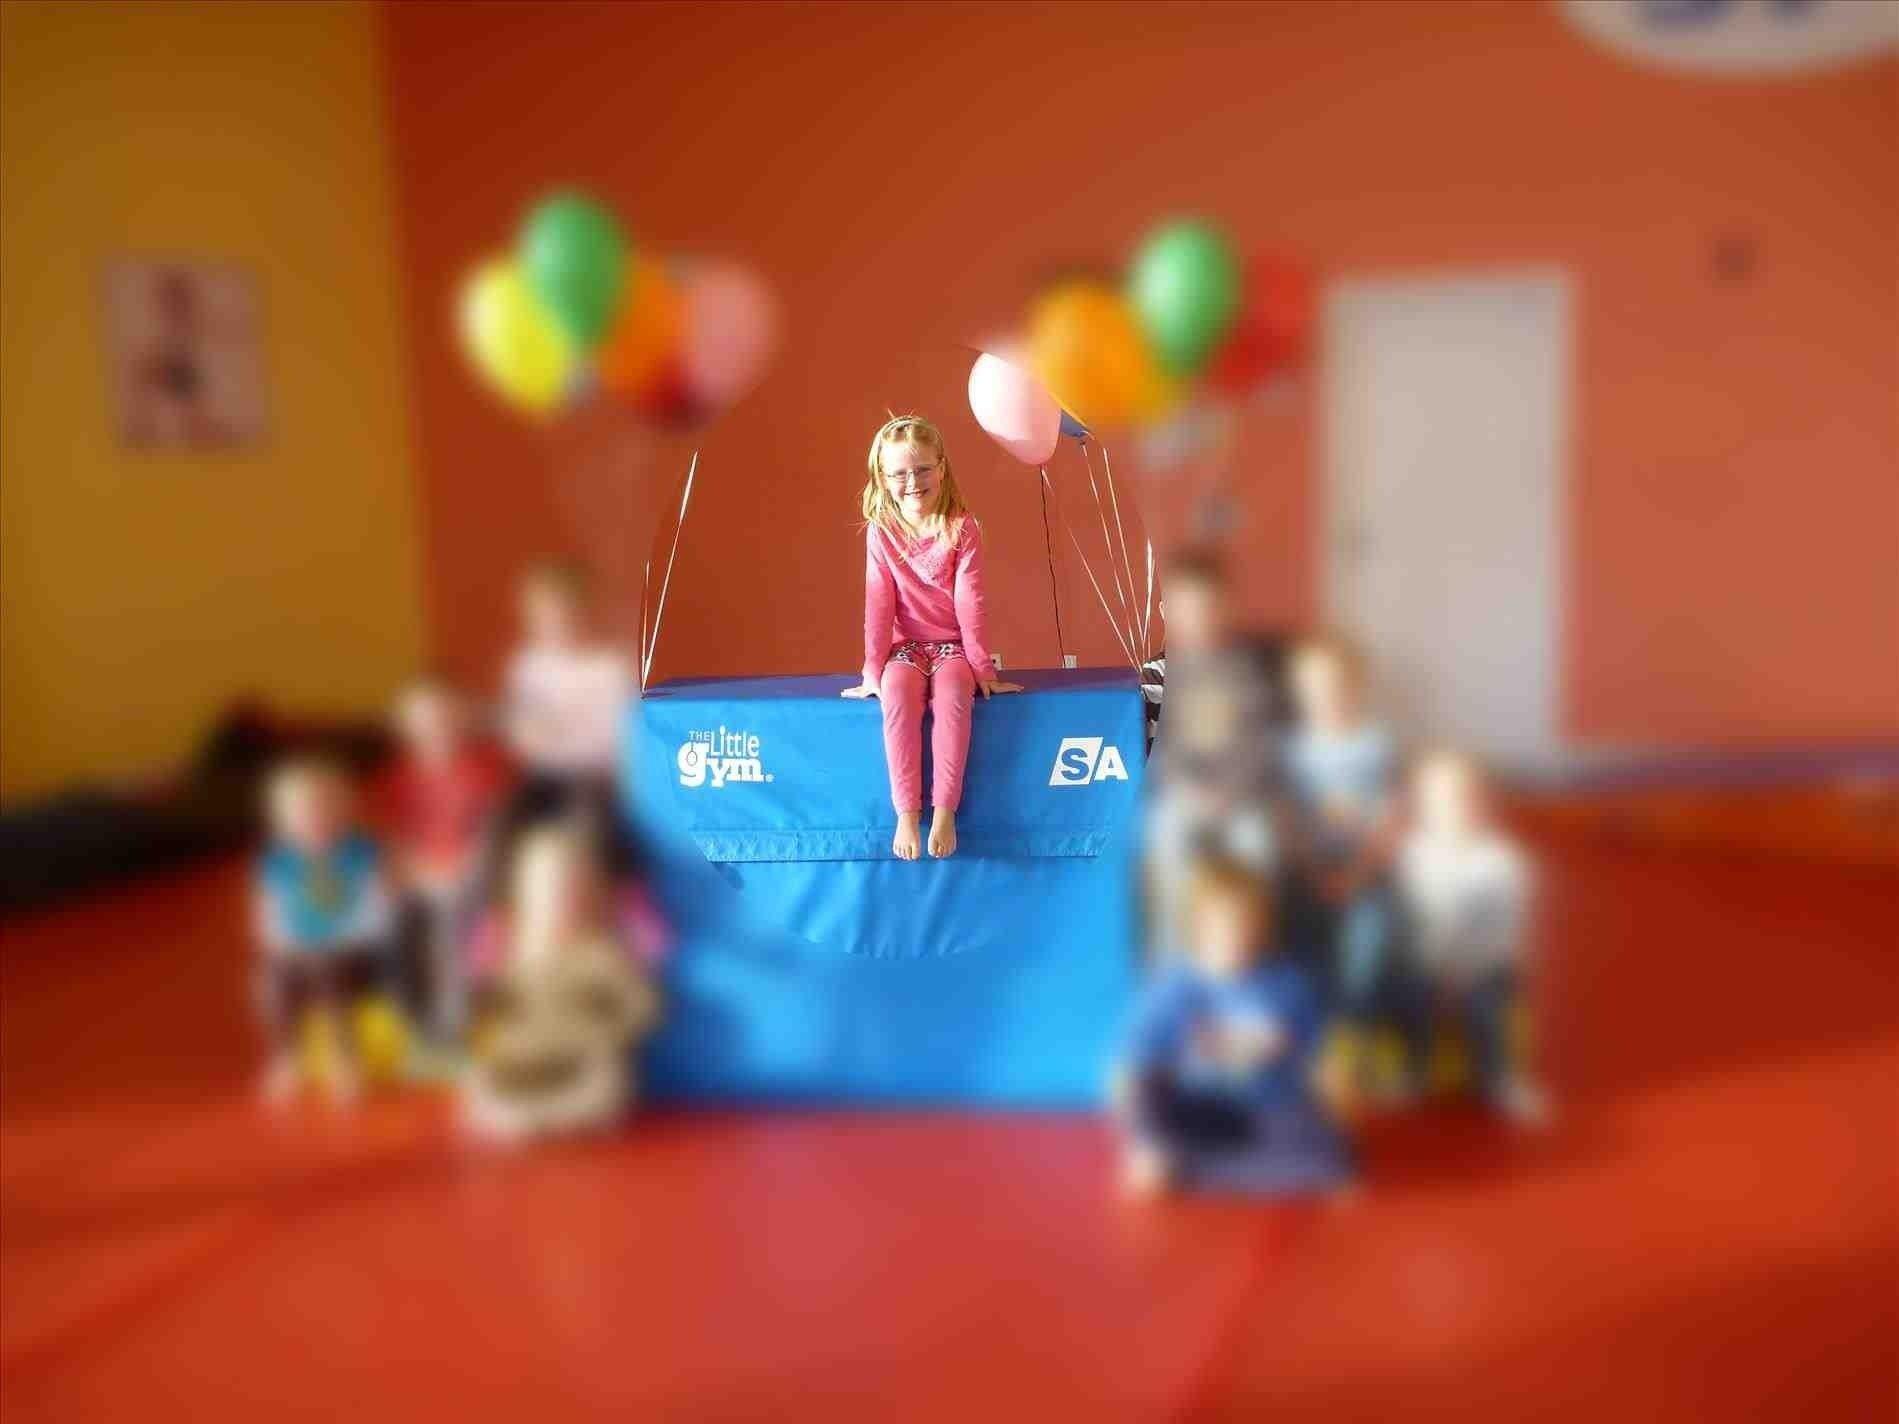 10 Great 12 Yr Old Birthday Ideas good birthday party ideas for 12 year olds ntskala 2021